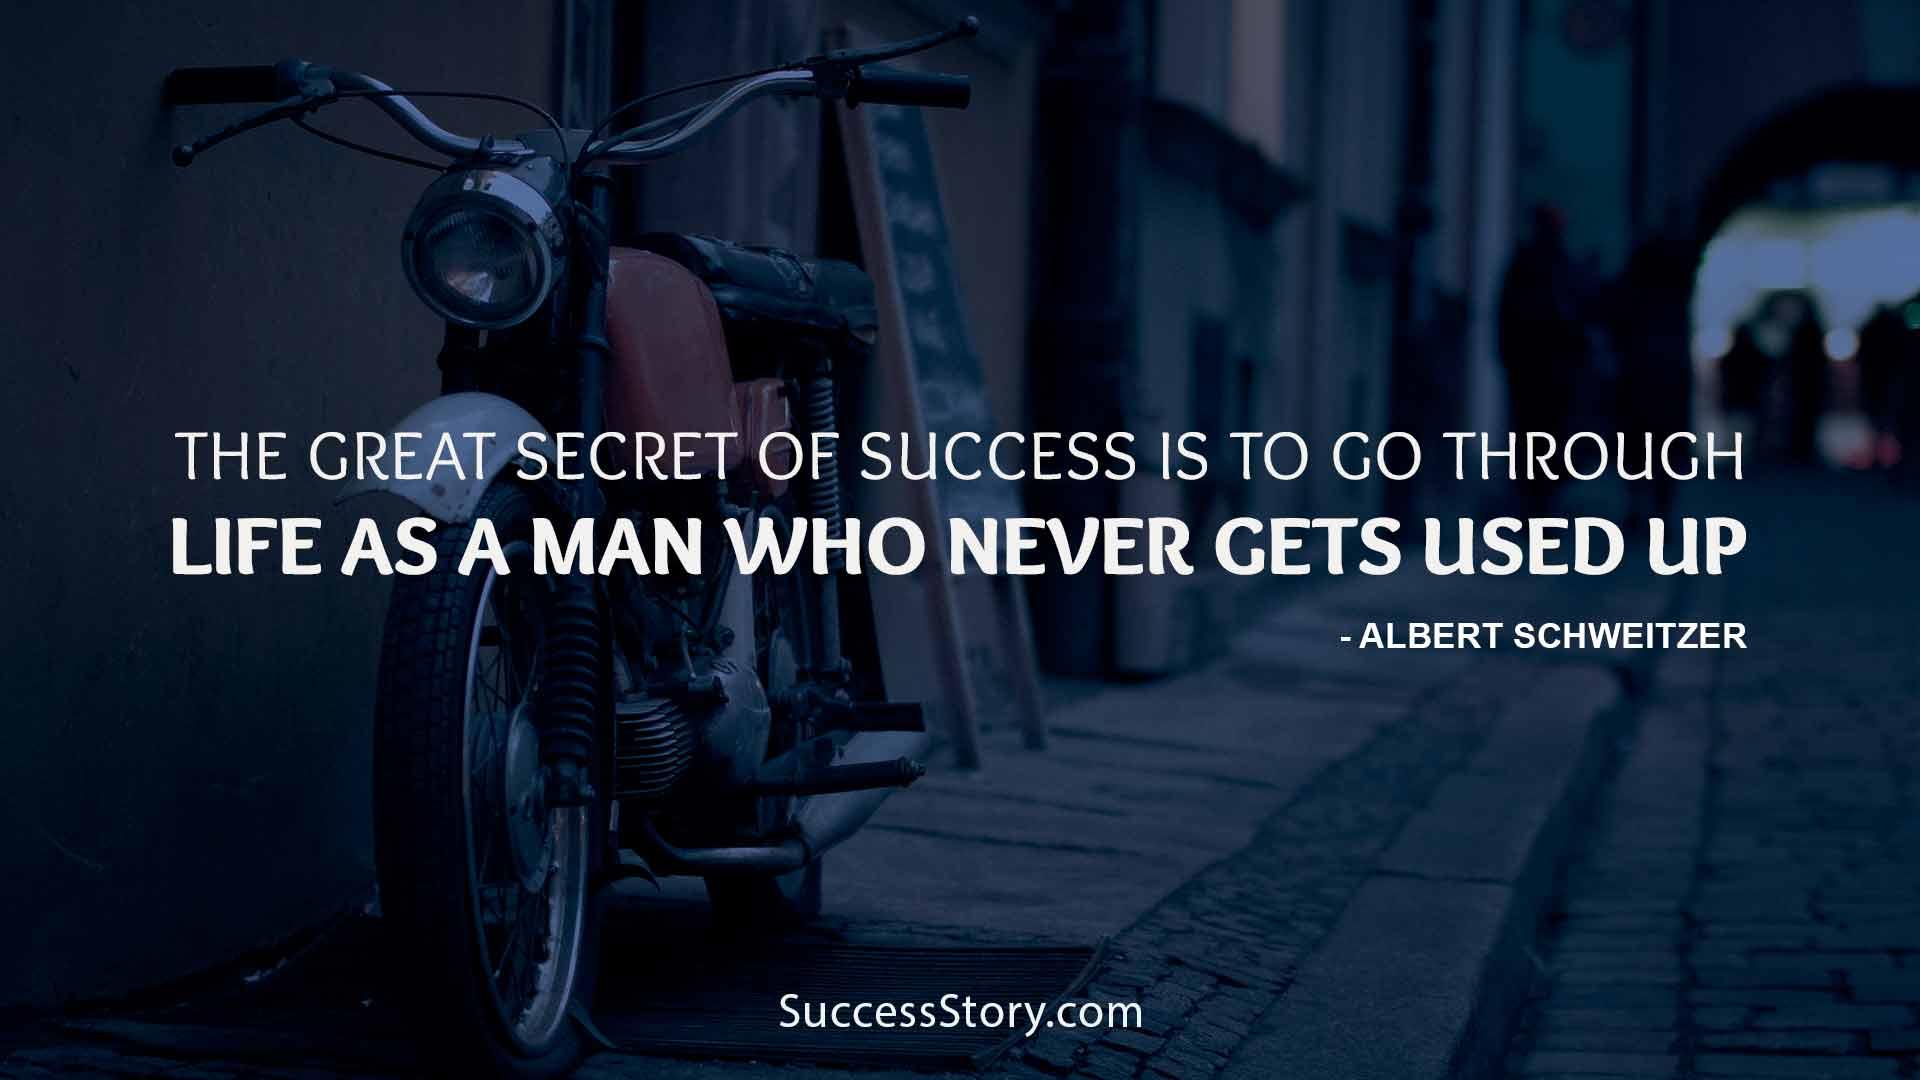 The great secret of success